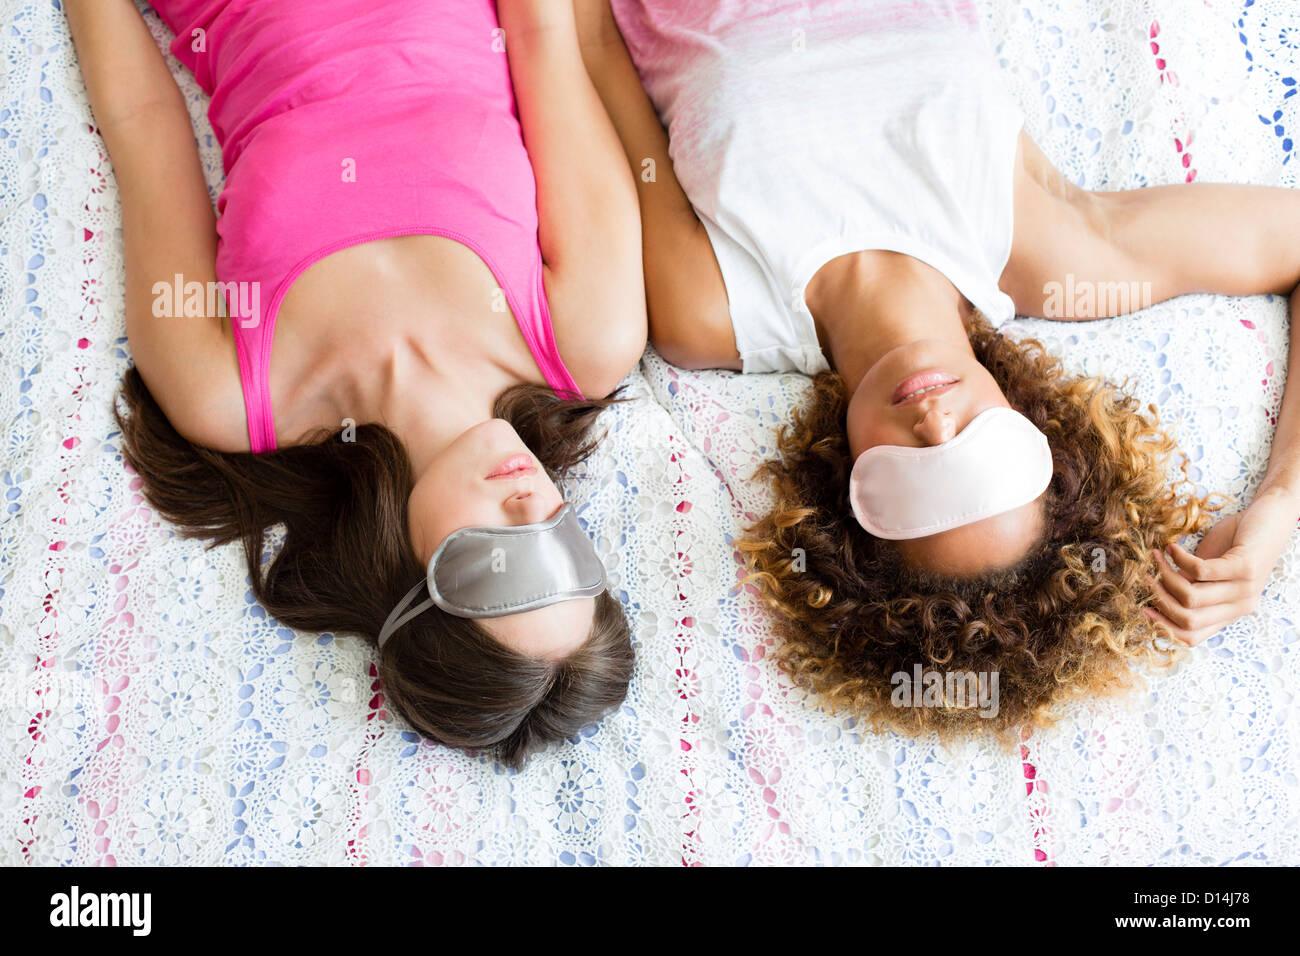 Sleeping woman wearing face masks - Stock Image